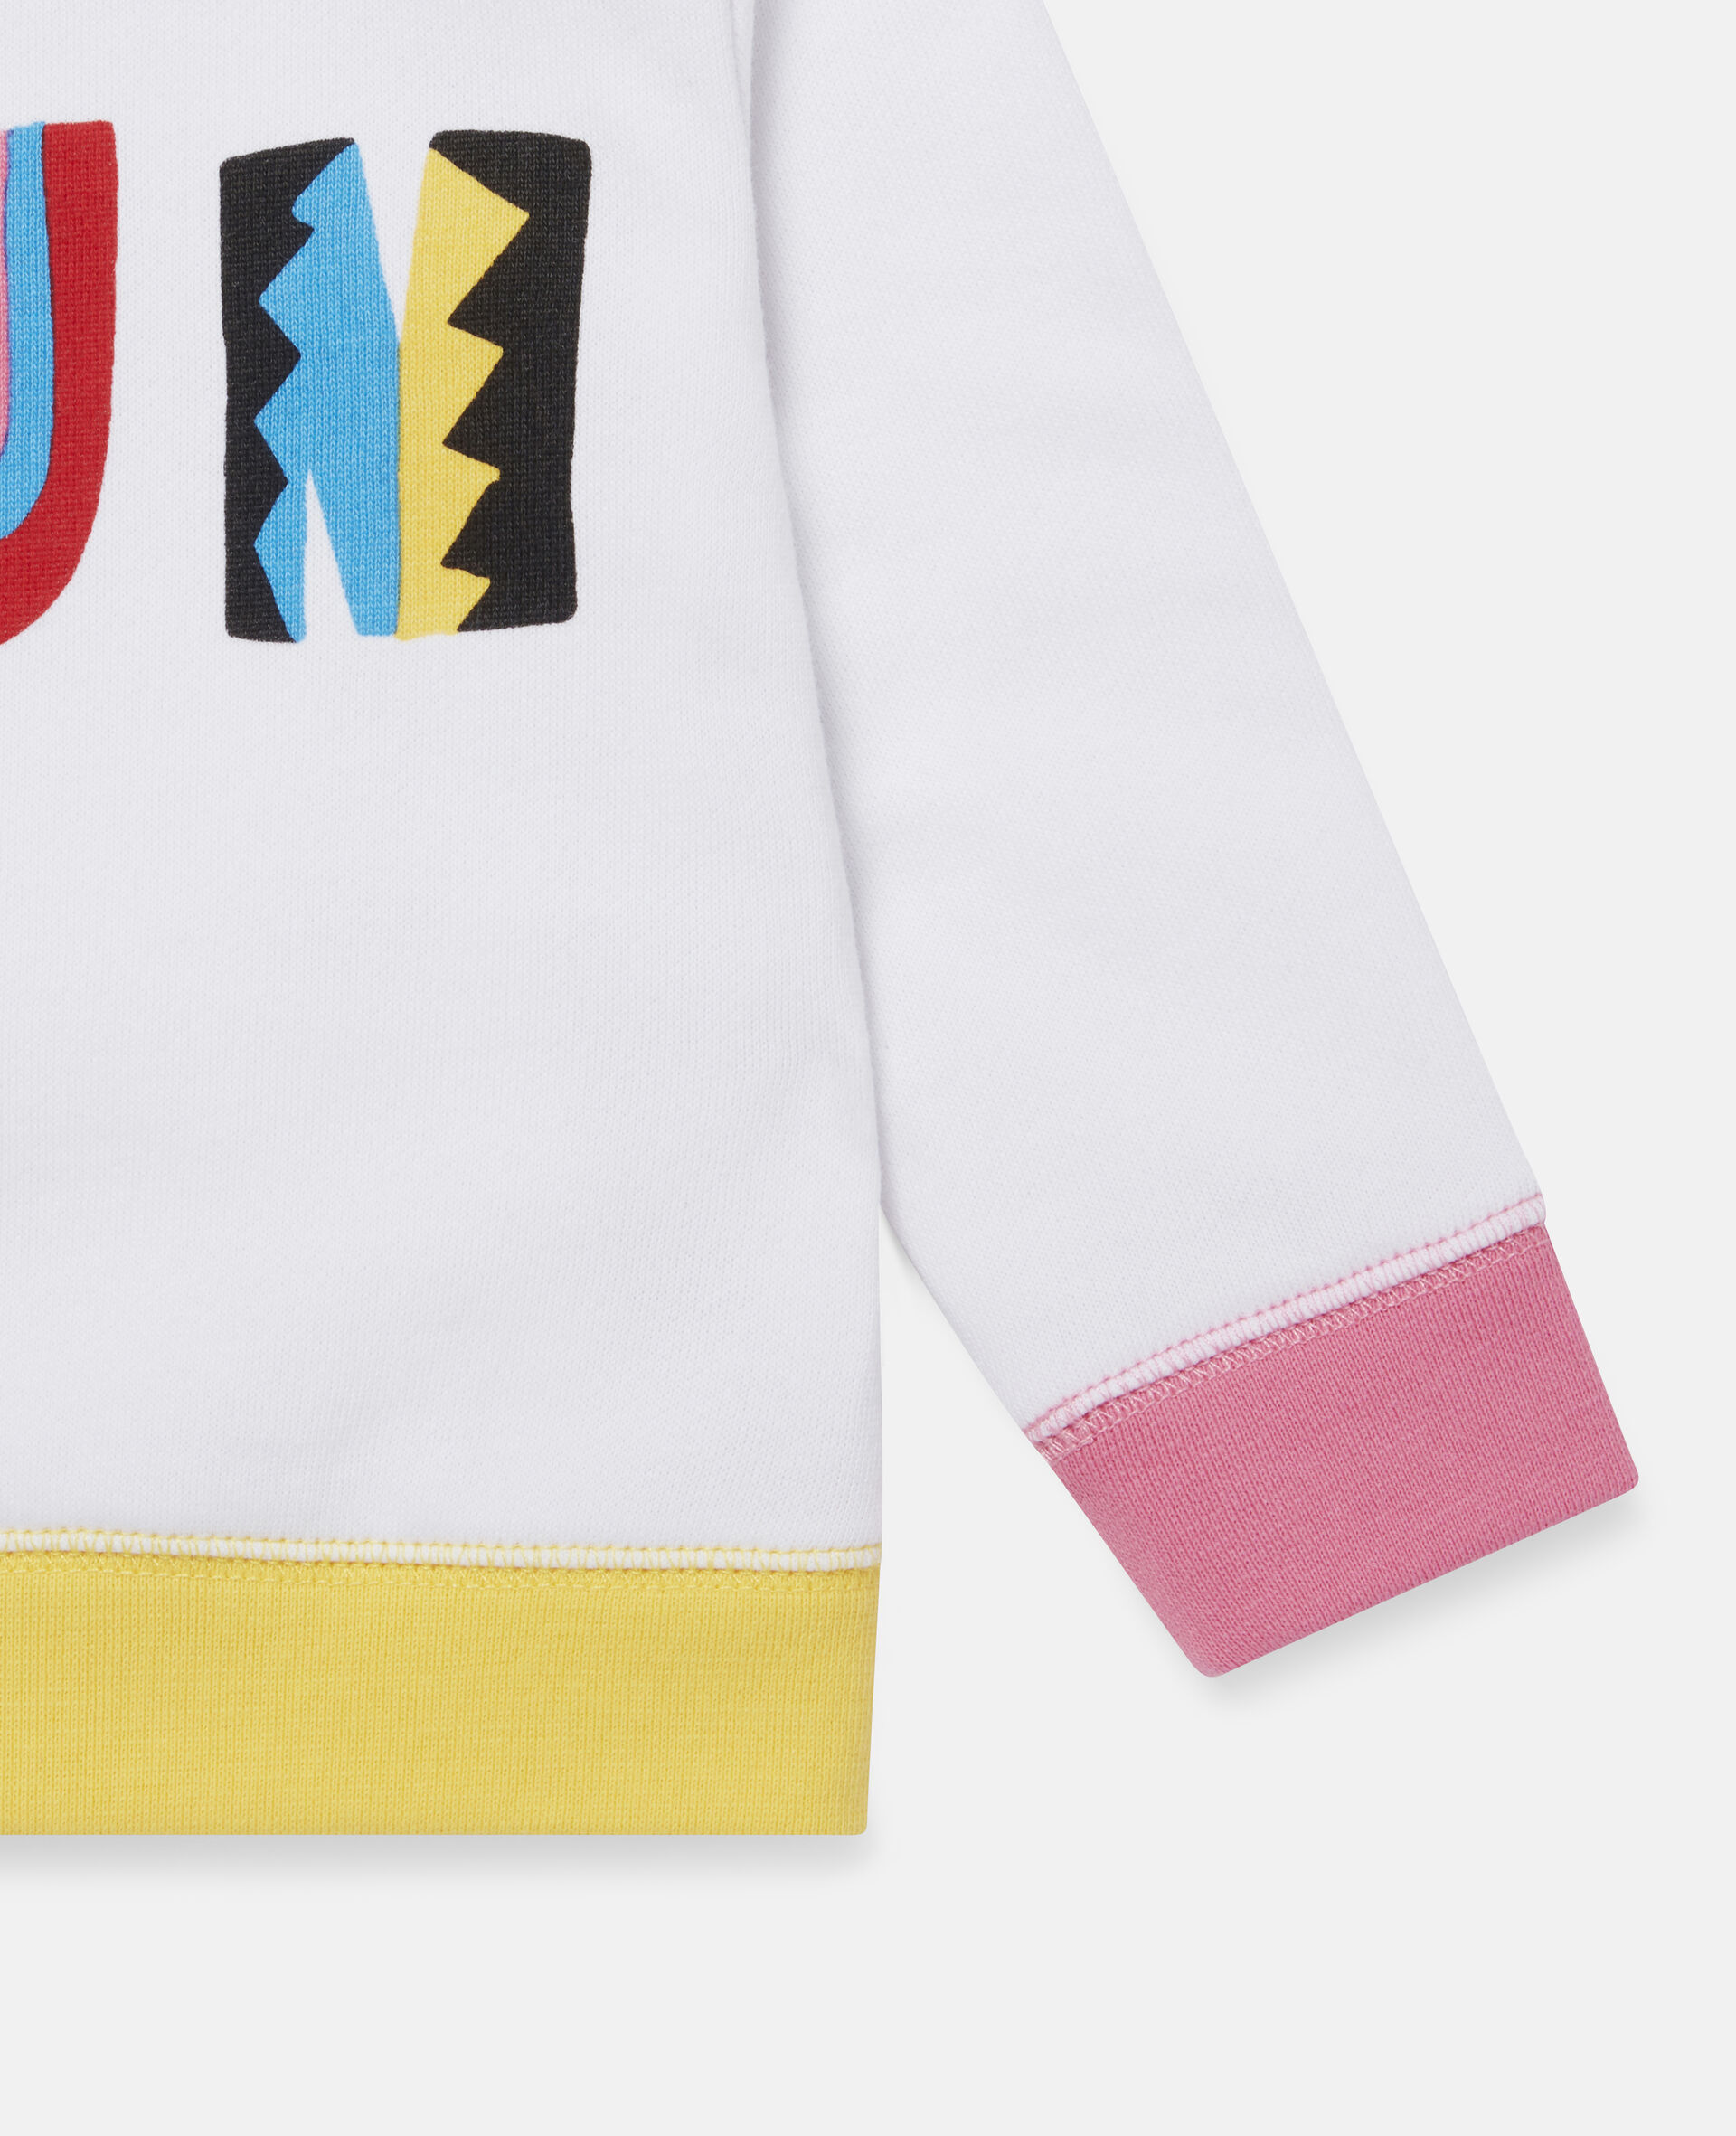 Fröhliches blockfarbenes Fleece-Swat-Shirt-Weiß-large image number 2